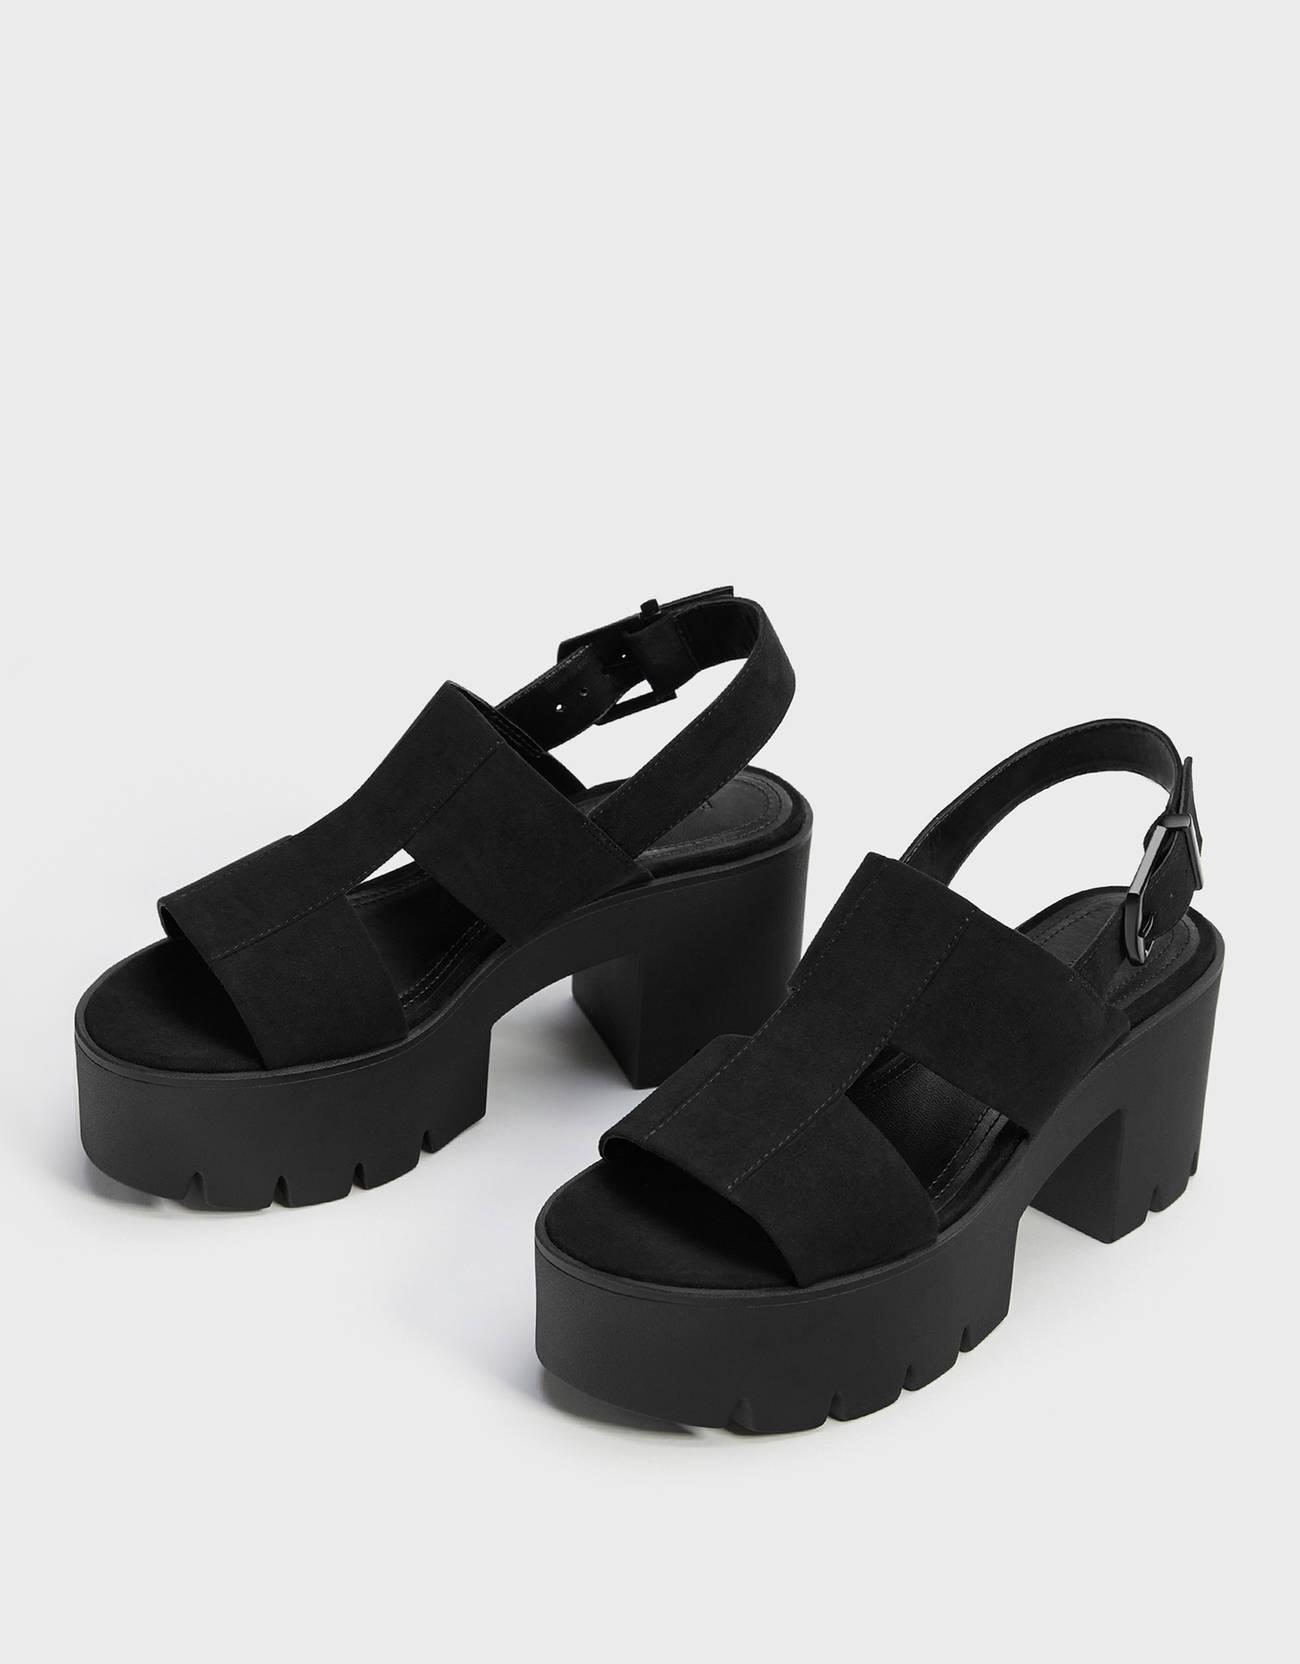 Sandalias de plataforma y suela chunky